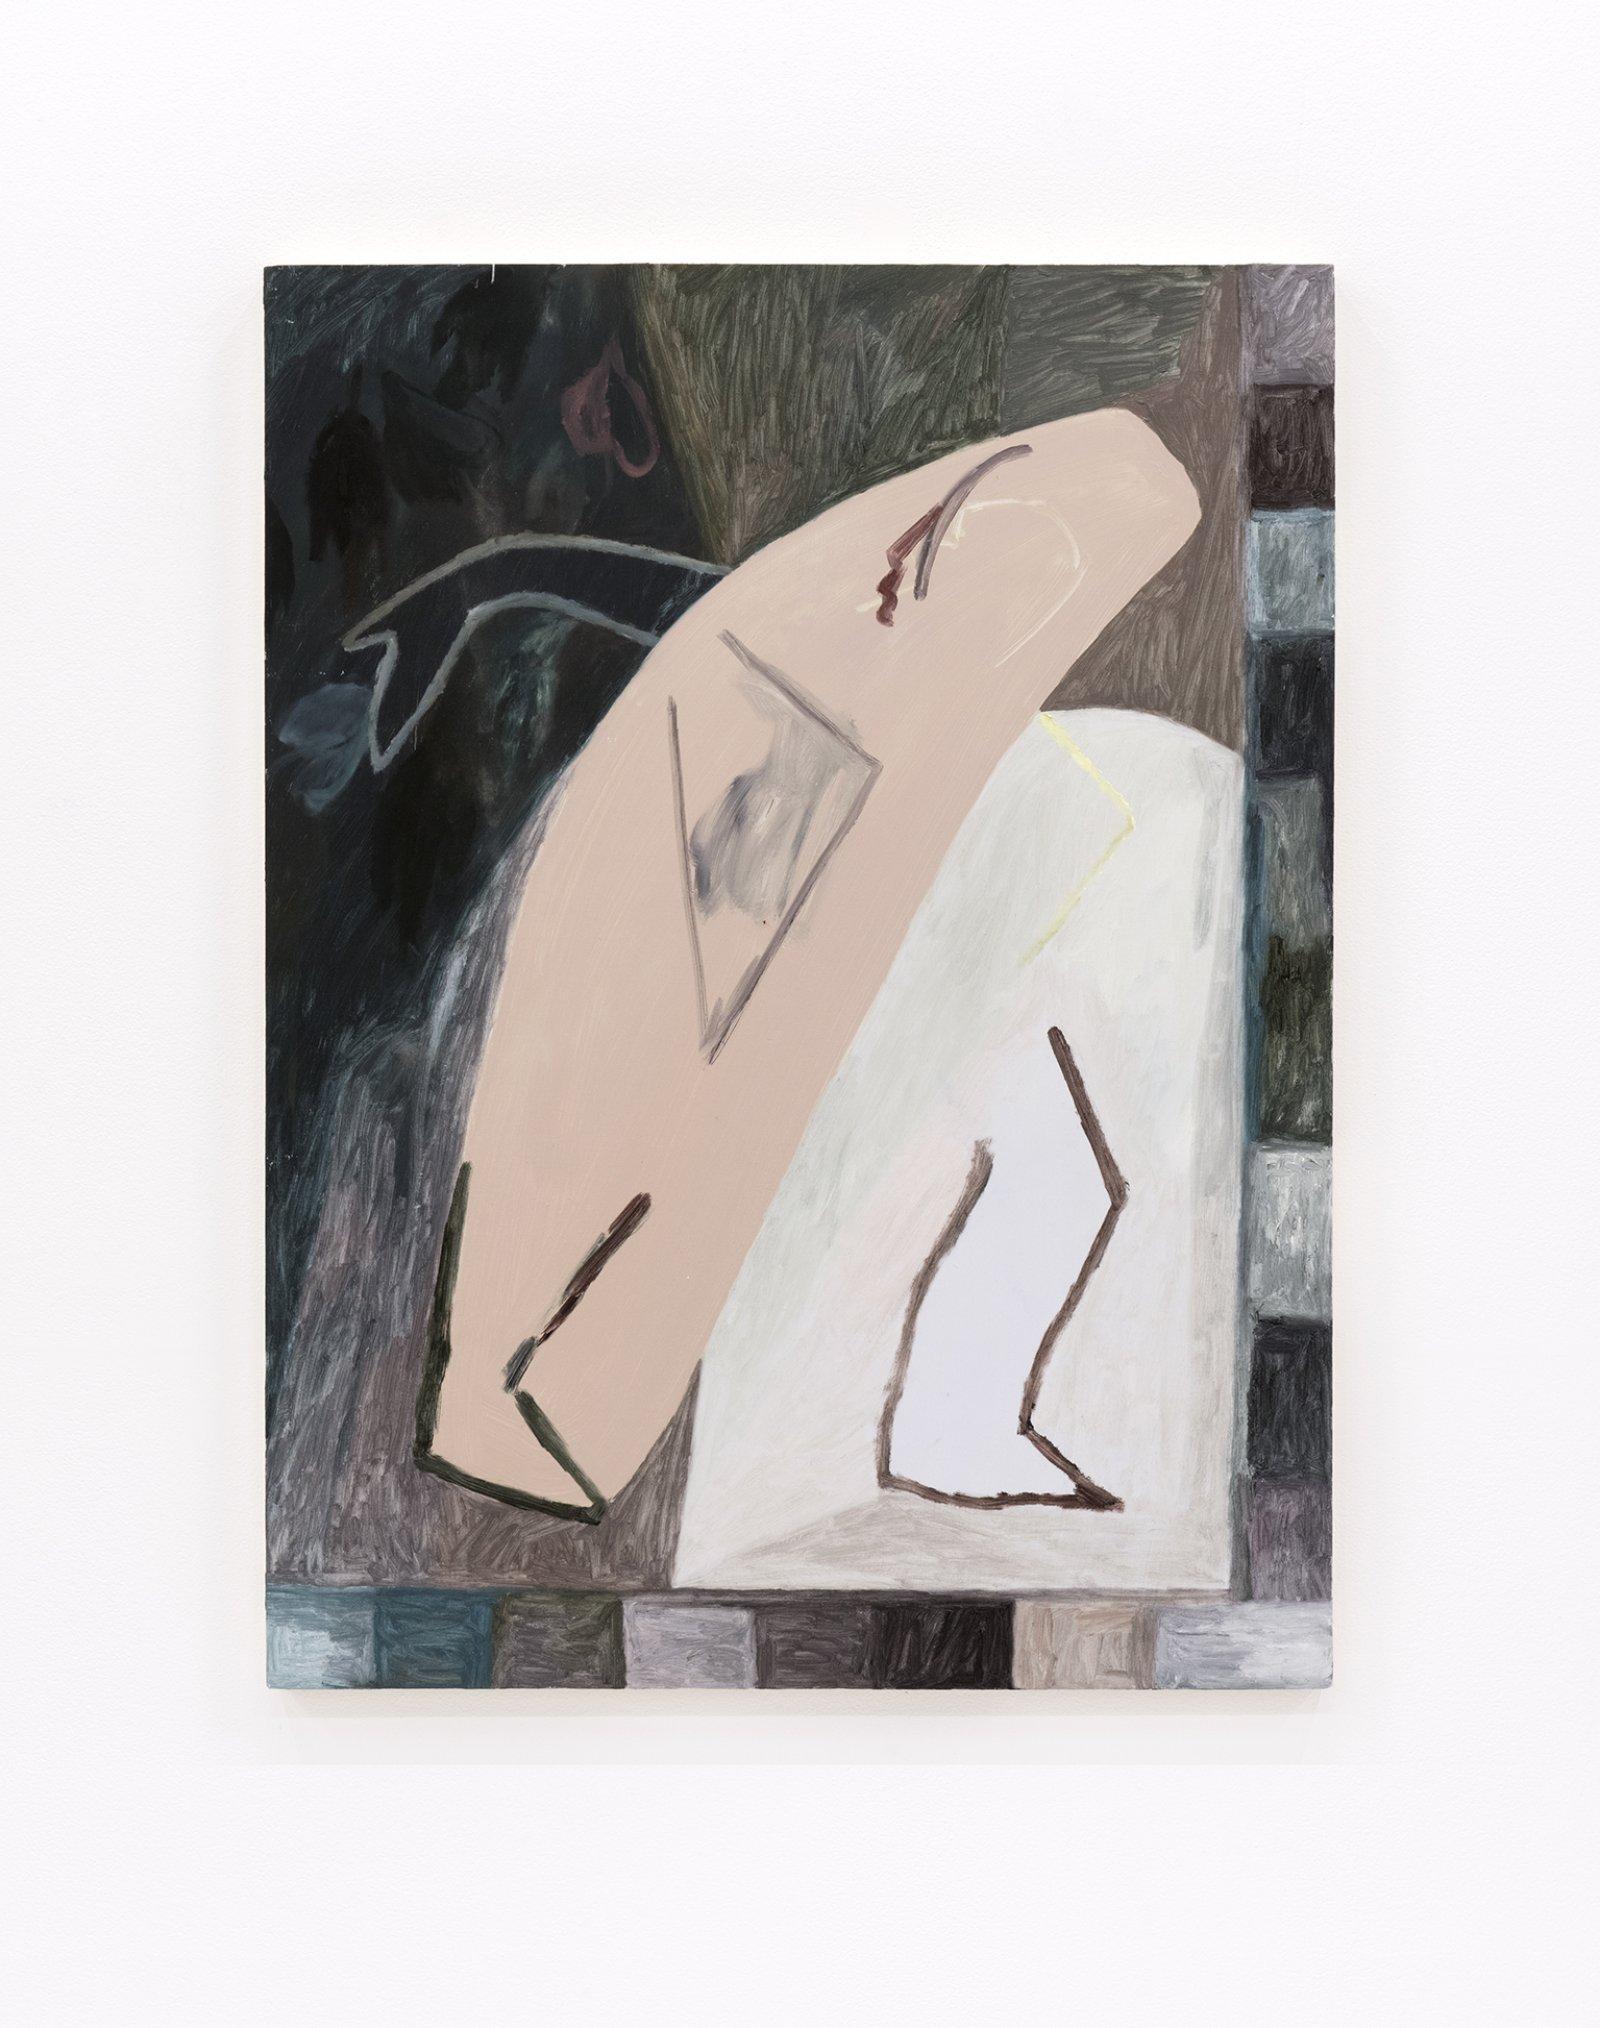 Rebecca Brewer, The Improviser, 2012, oil on panel, 24 x 20 in. (61 x 51 cm)